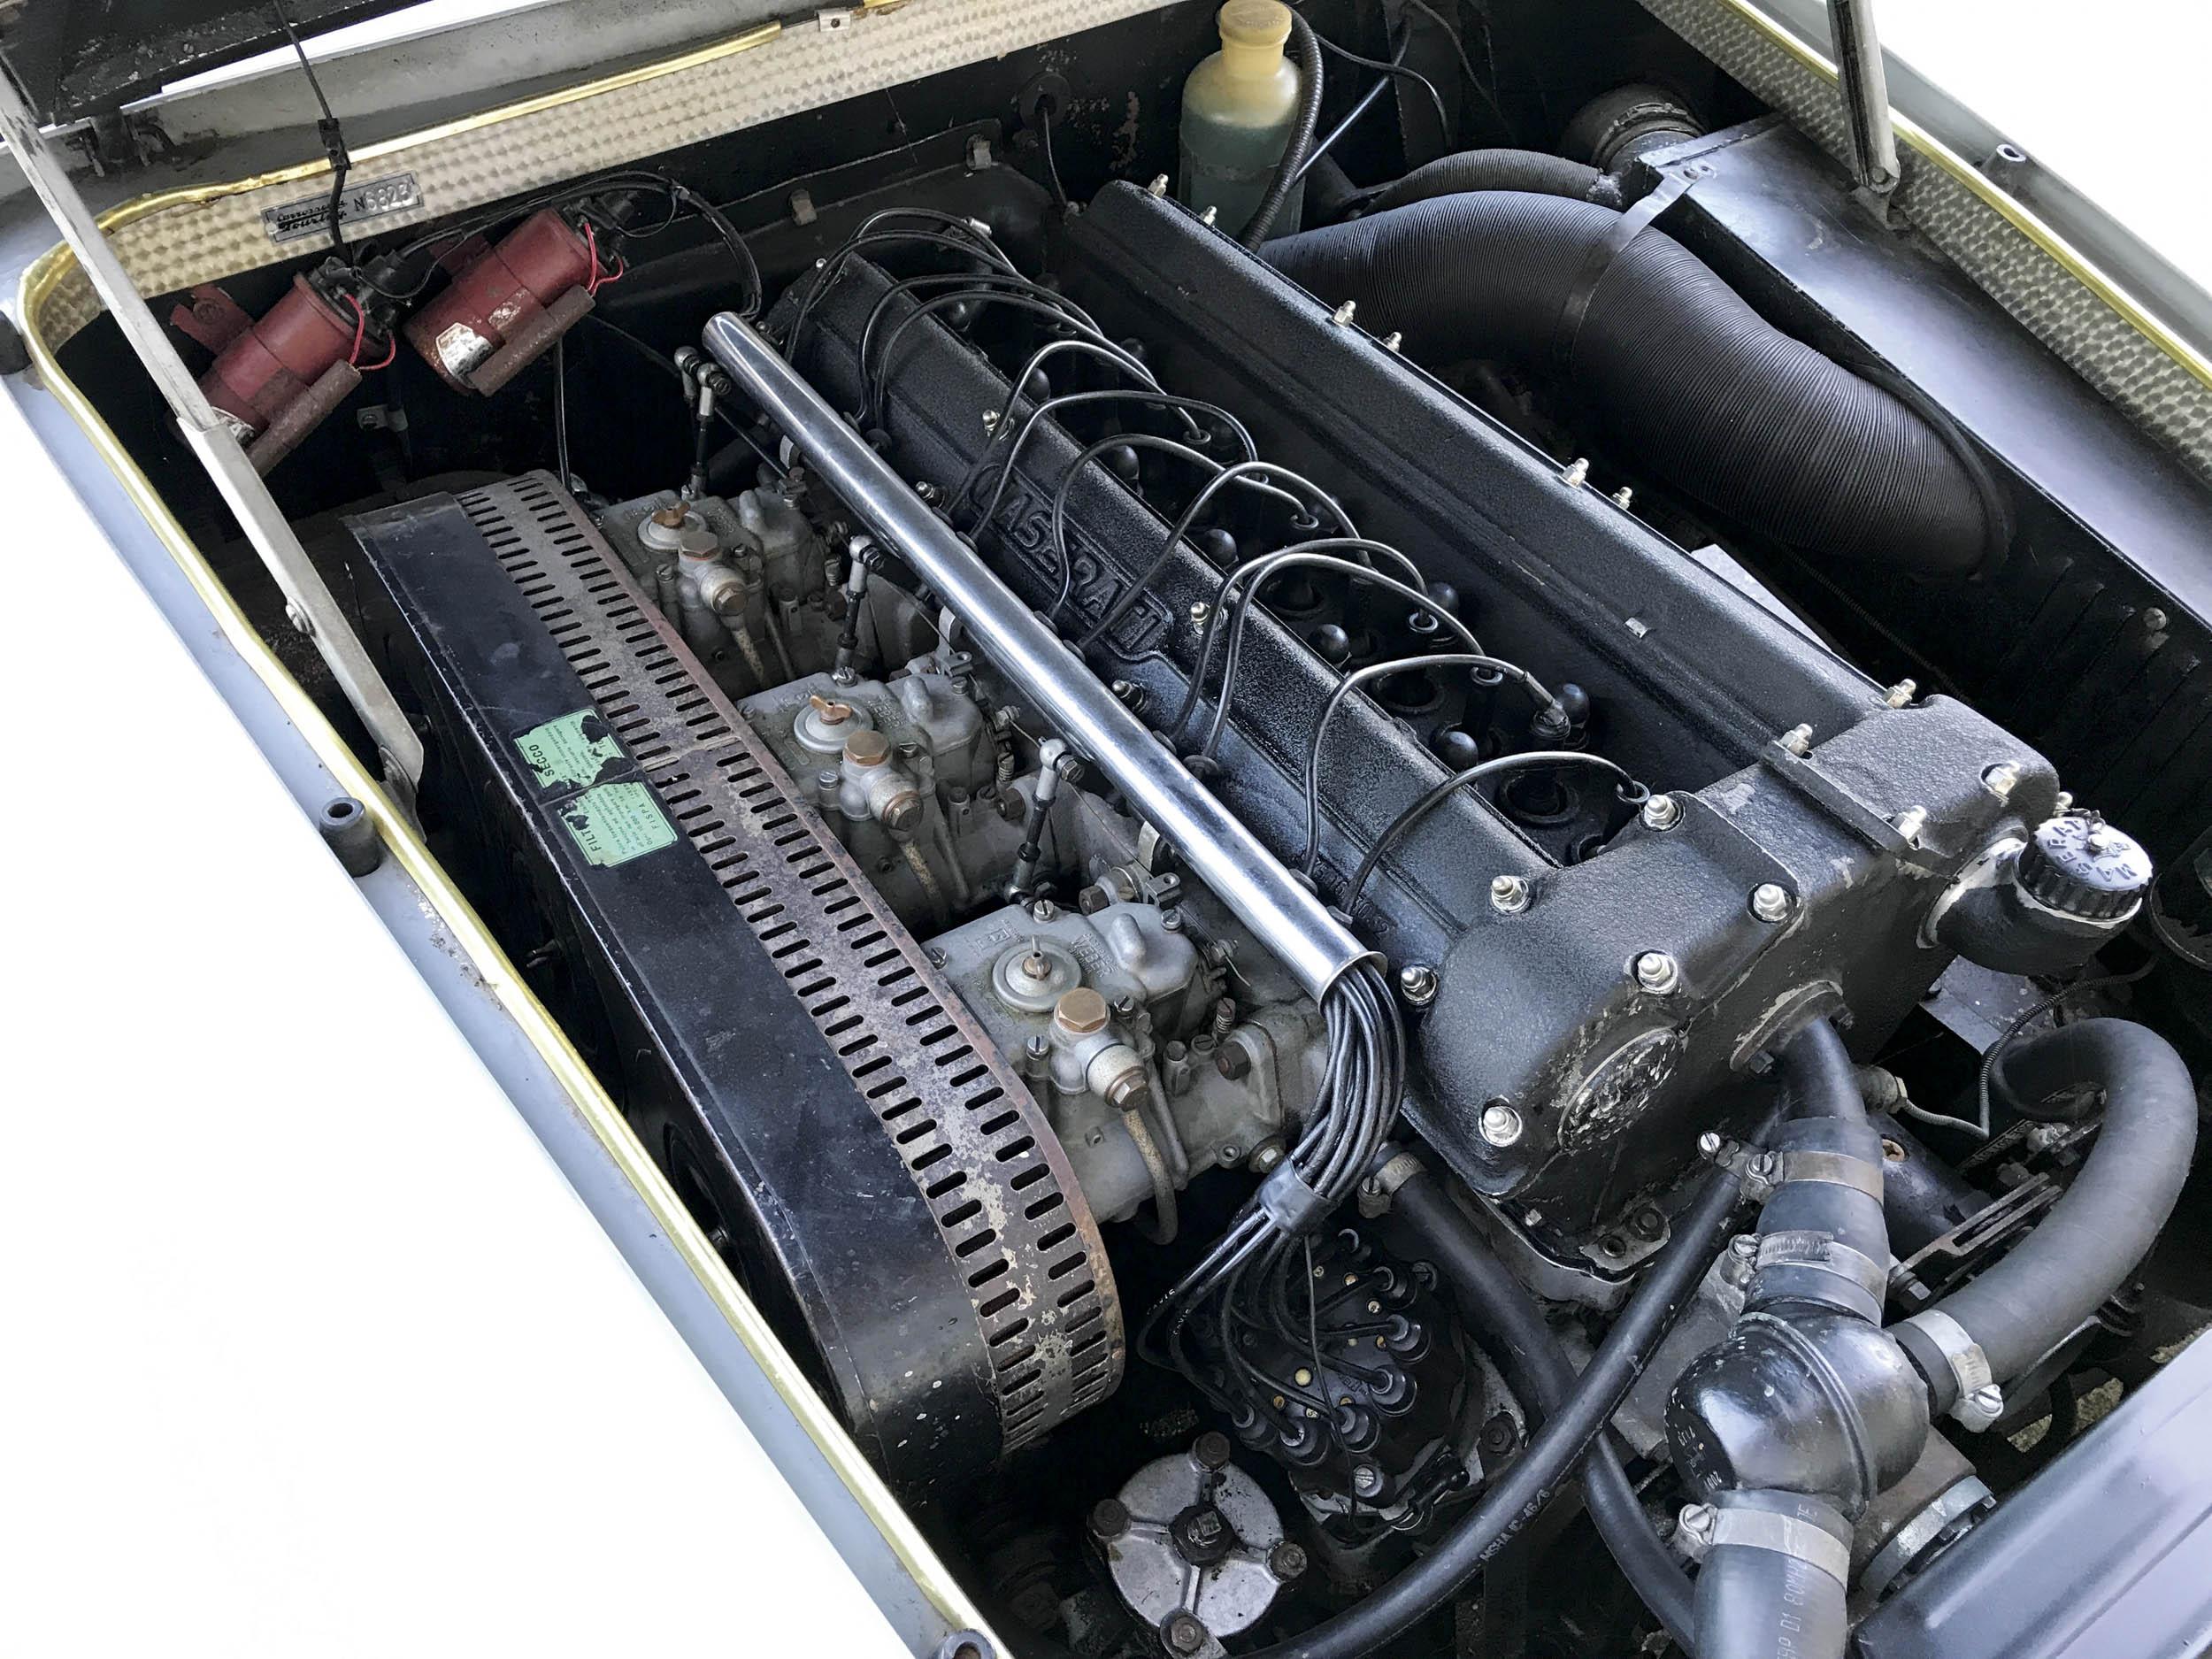 1959 Maserati 3500GT engine